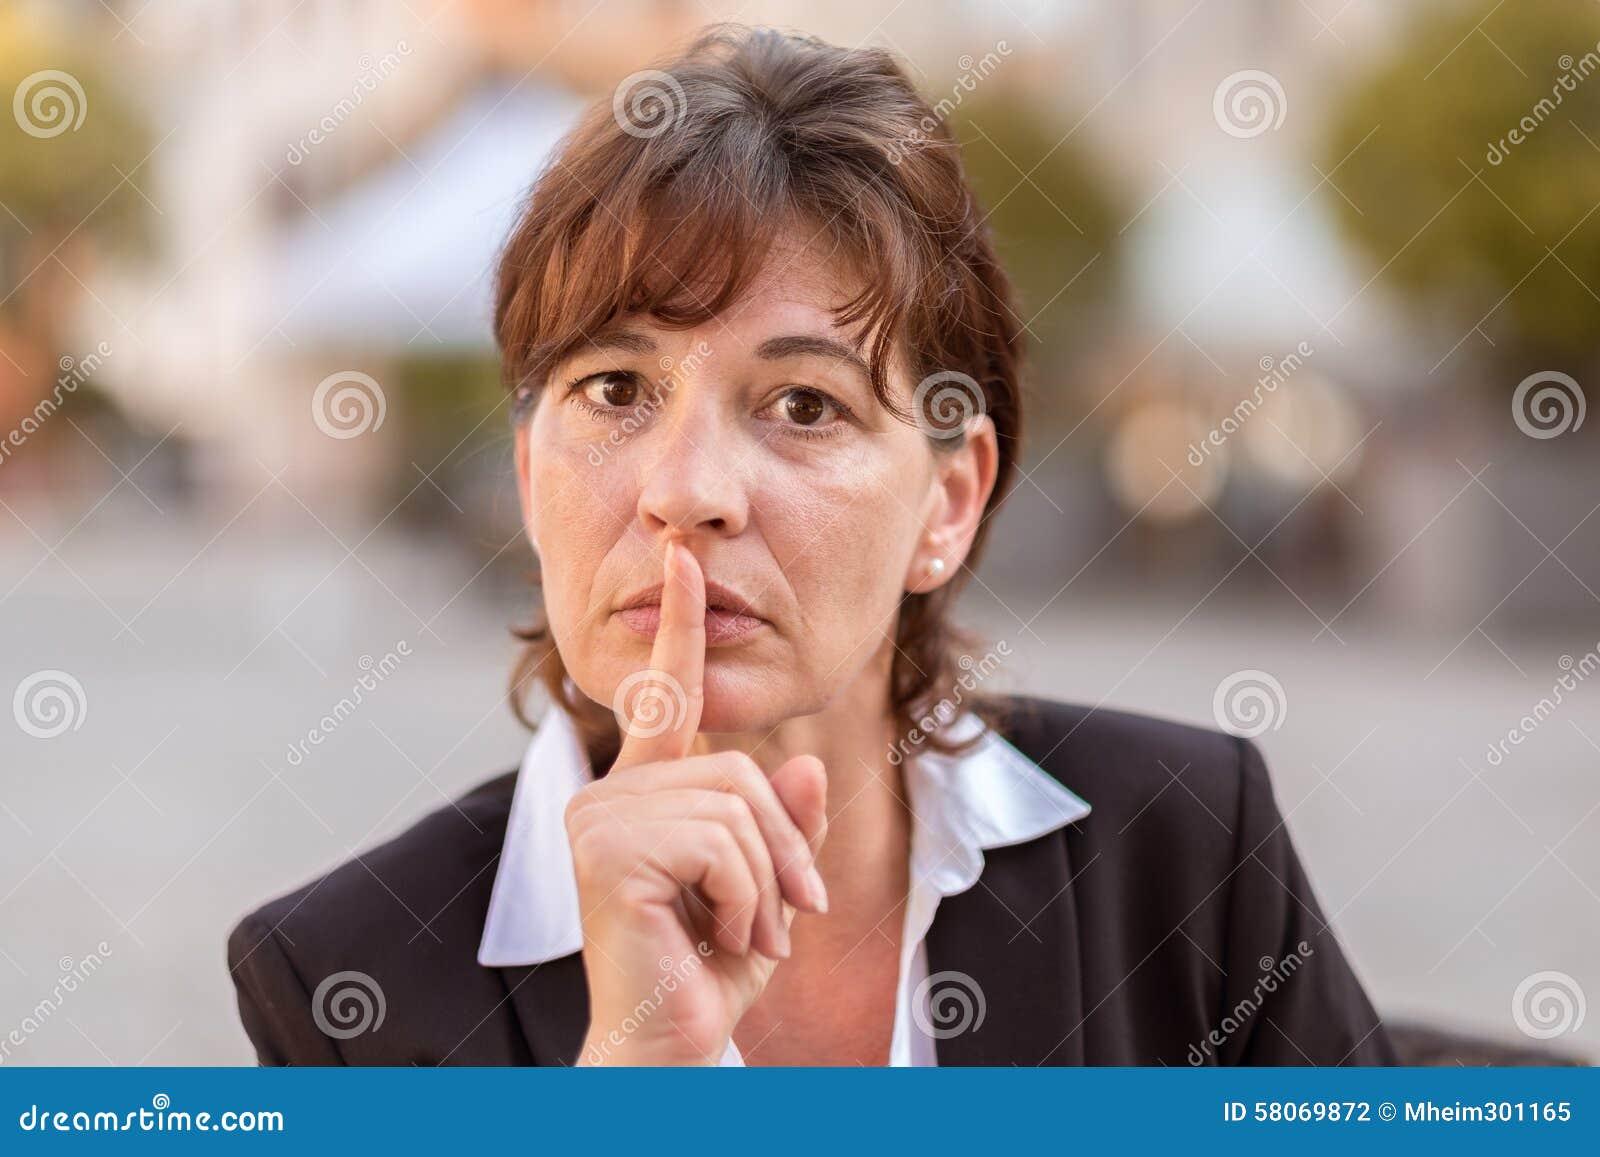 onderneemster met haar die vinger aan haar lippen wordt